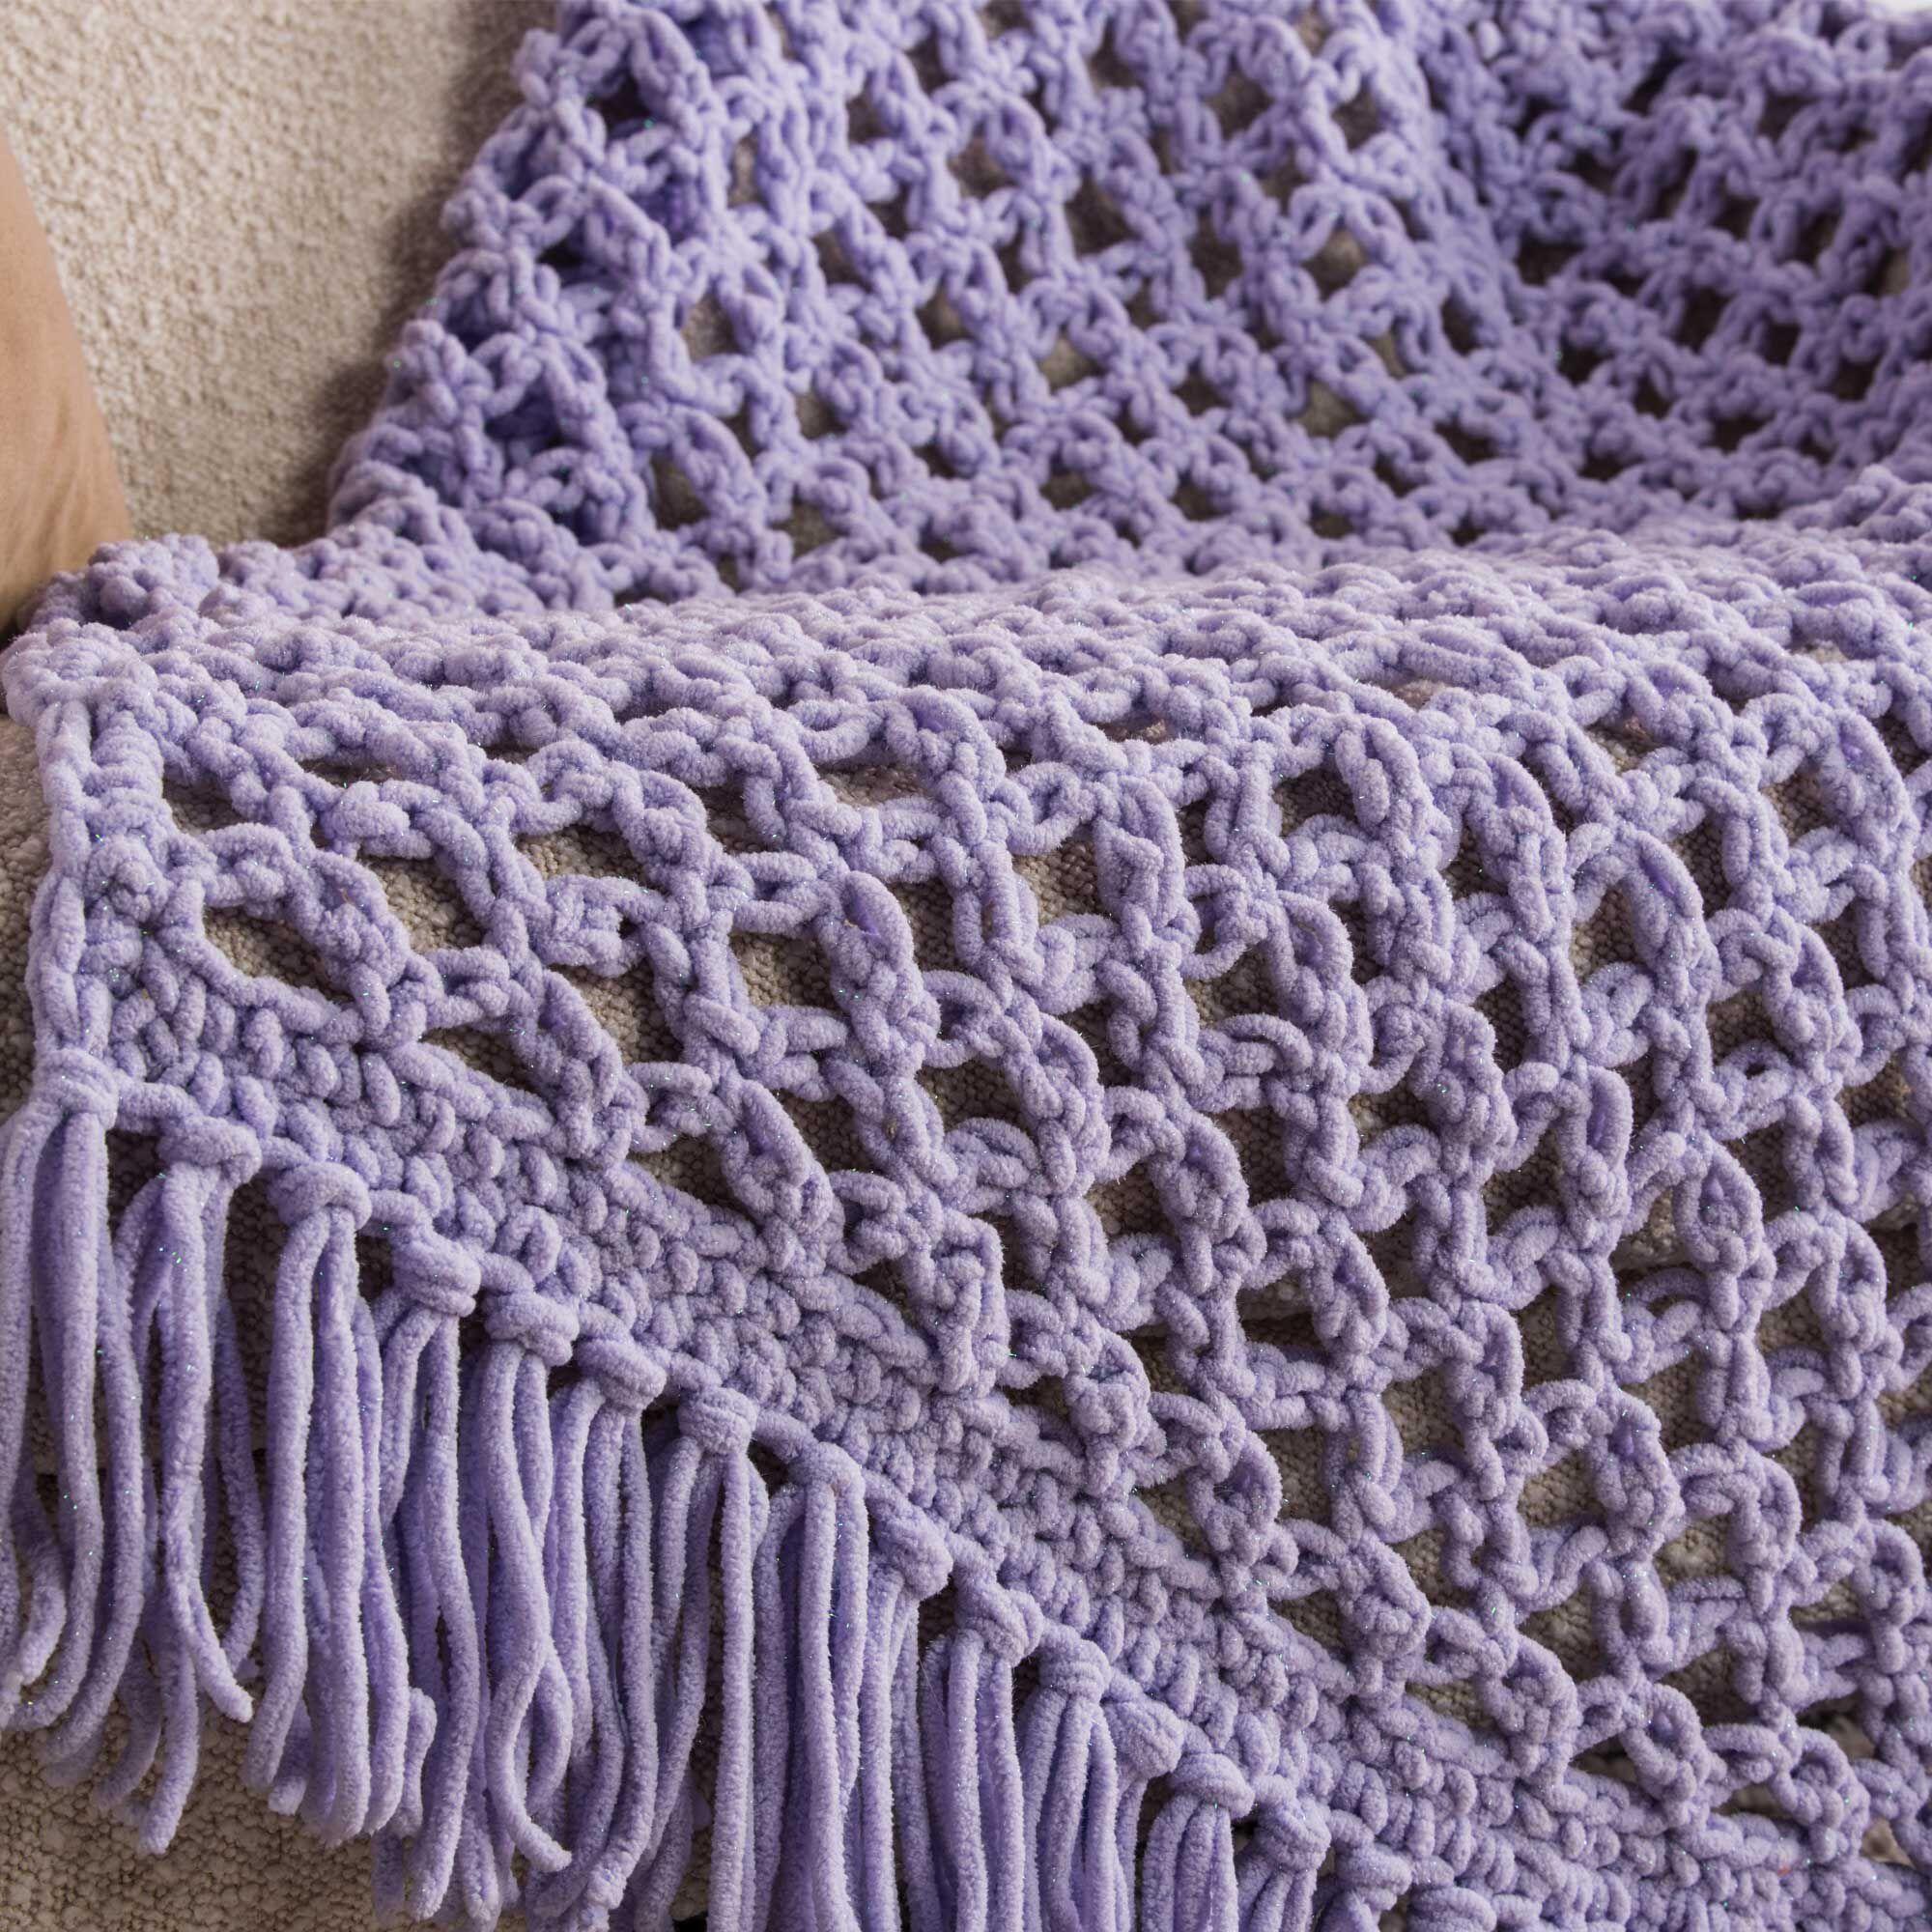 Bernat Love Knot Crochet Blanket Sparkle | Yarnspirations